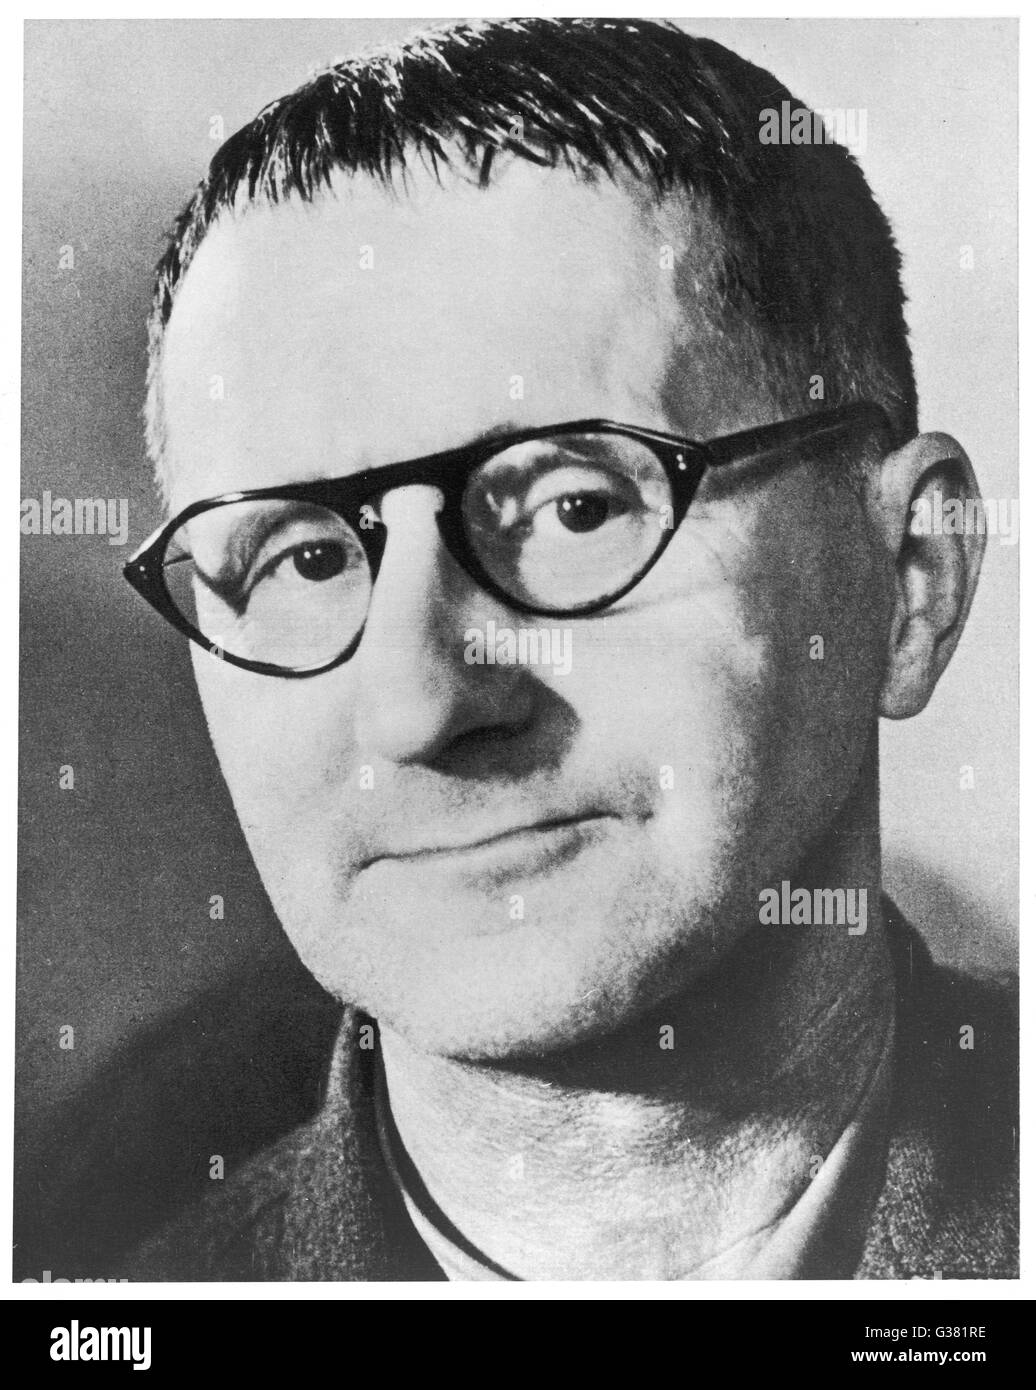 BERTOLT BRECHT  German writer        Date: 1898-1956 - Stock Image